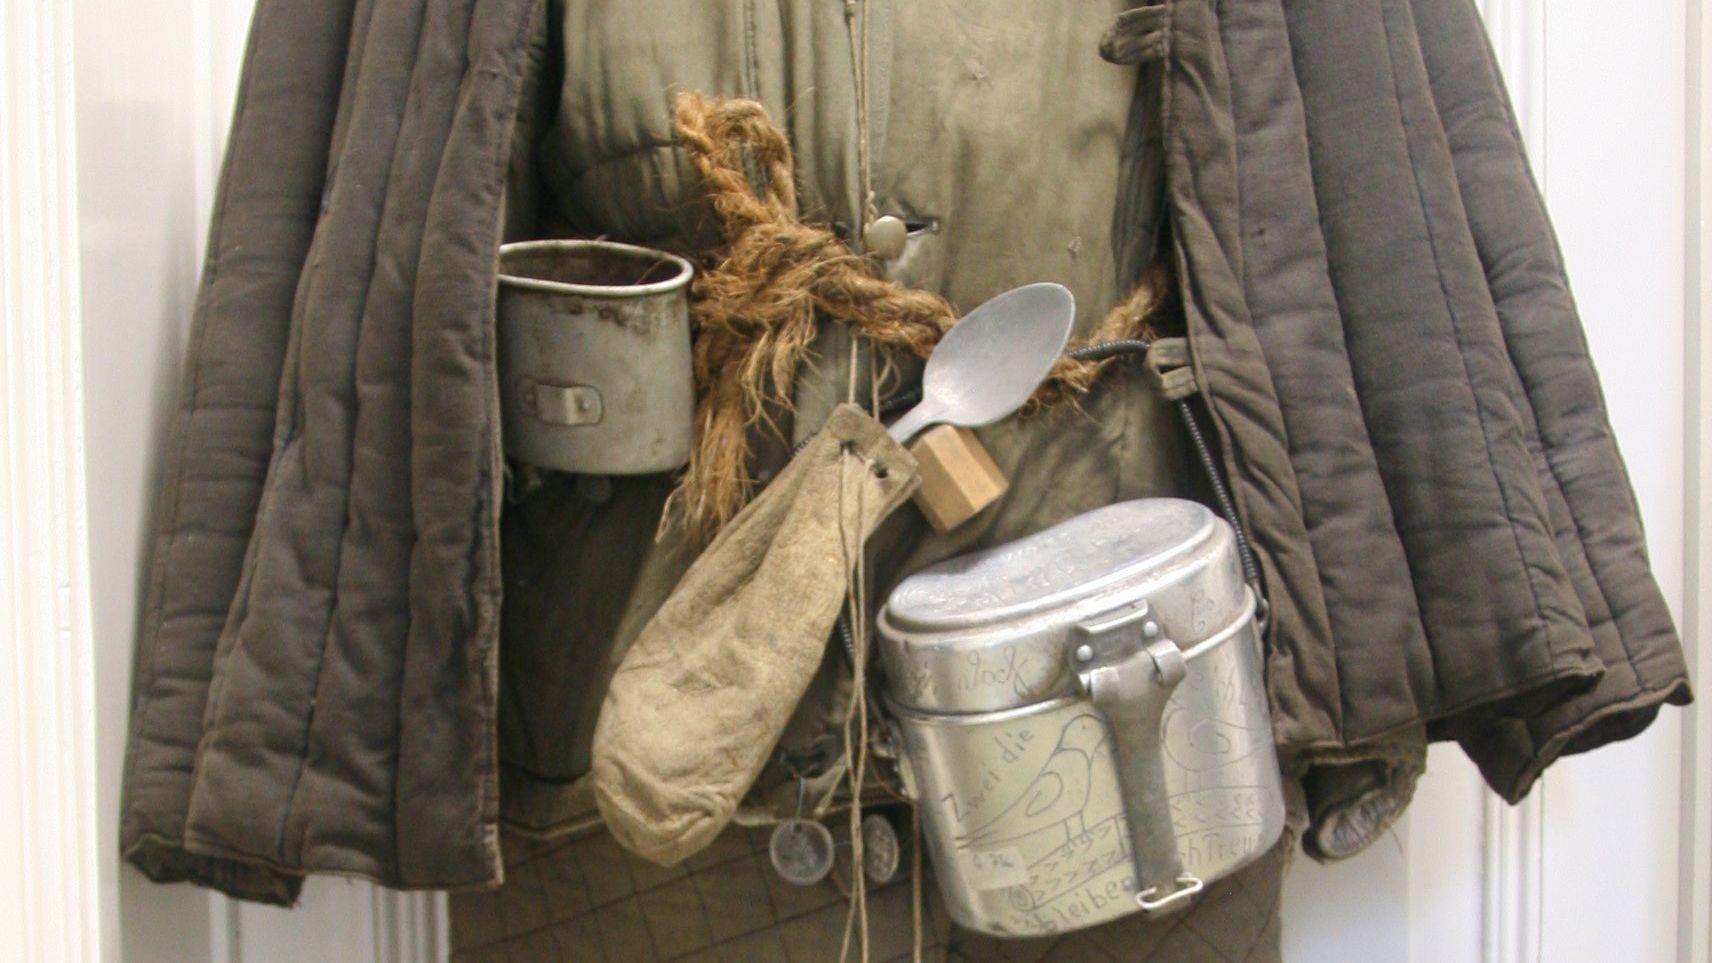 celler-garnison-museum-uniform-1933-1945-a